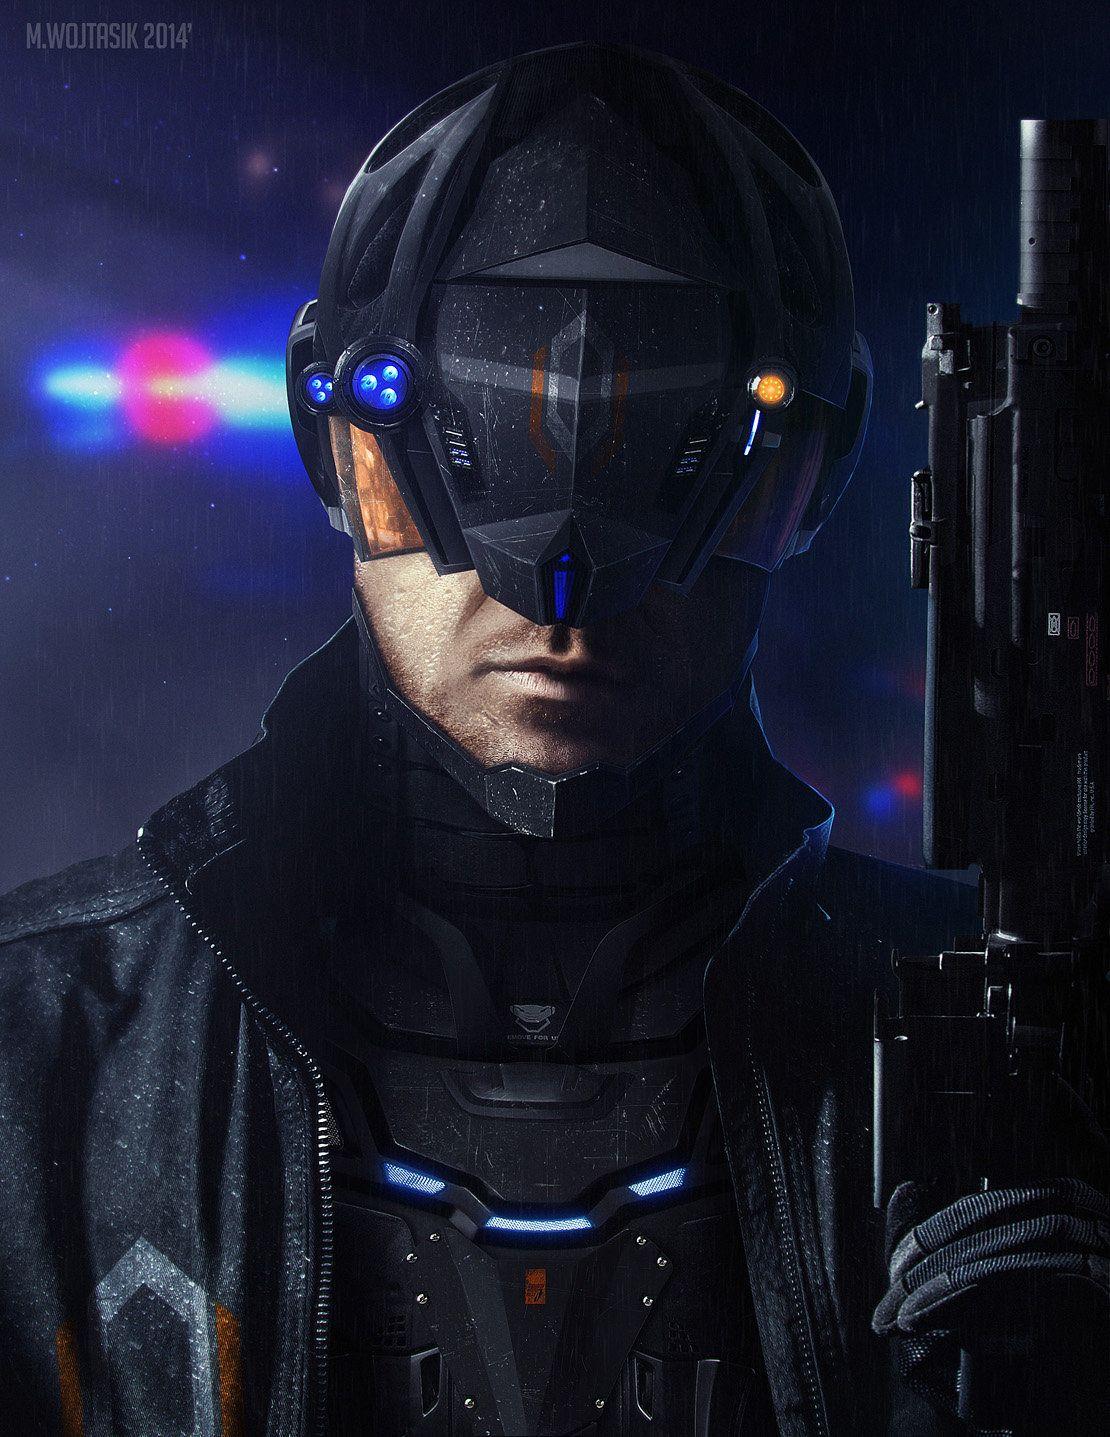 Cyberpunk Police Officer, Milosz Wojtasik on ArtStation at